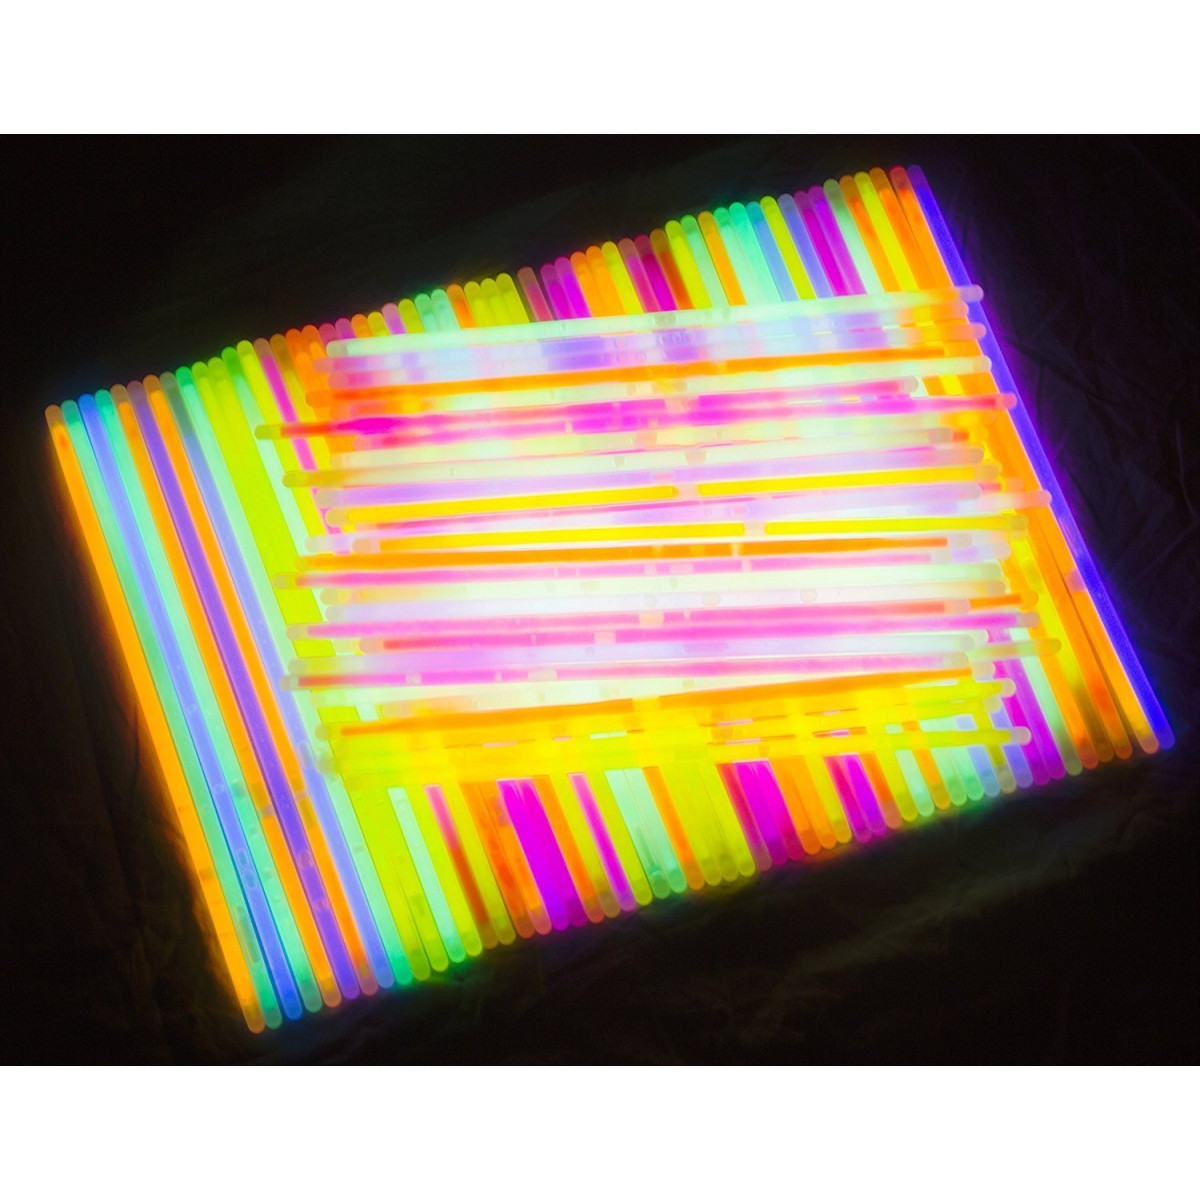 Glow Sticks Bulk 300 Count 8 Partysticks Brand Premium In The Dark Light